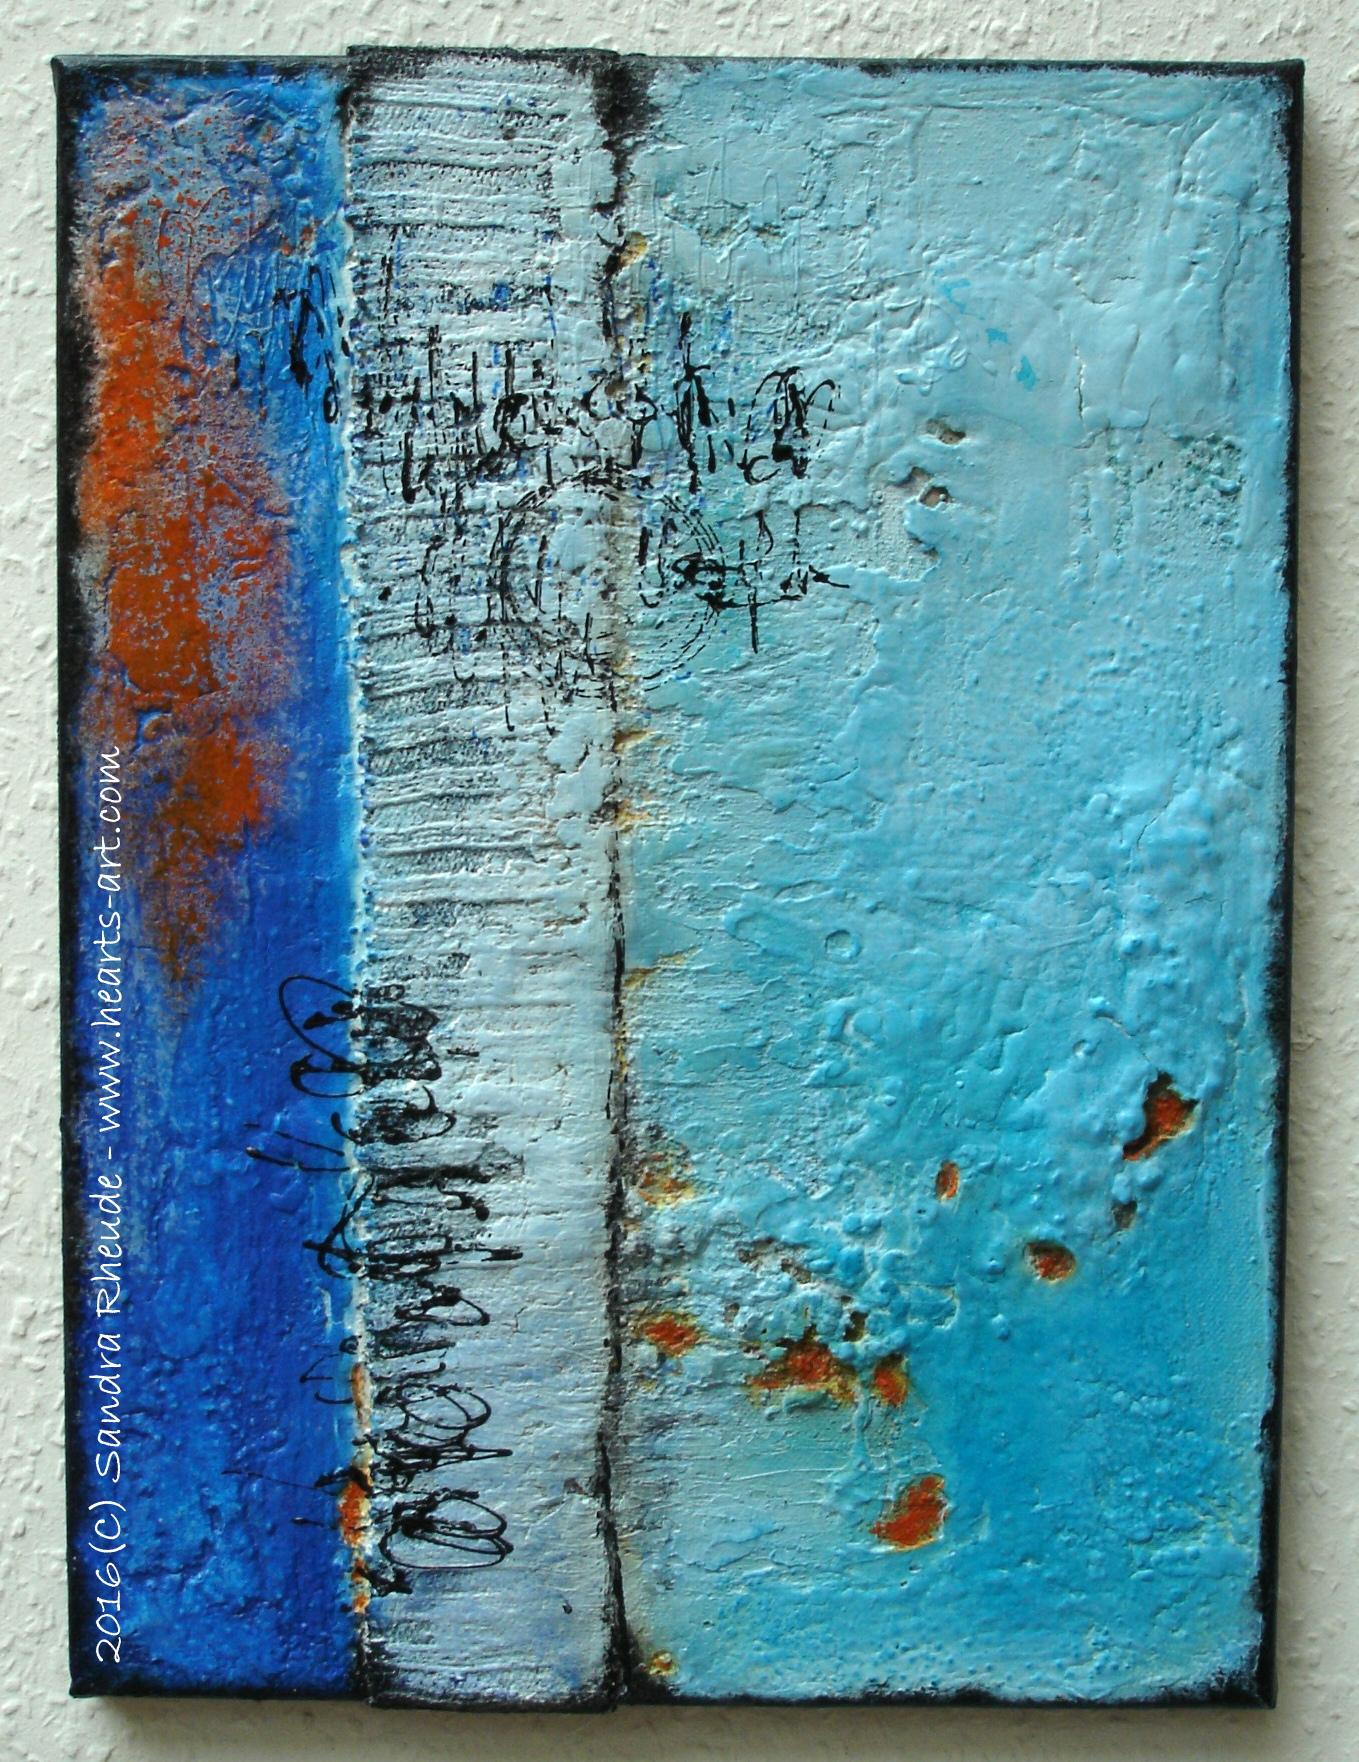 'Südlicht' - 2016/24 - Acryl/MixedMedia auf Leinwand - 30 x 40 cm - € 190